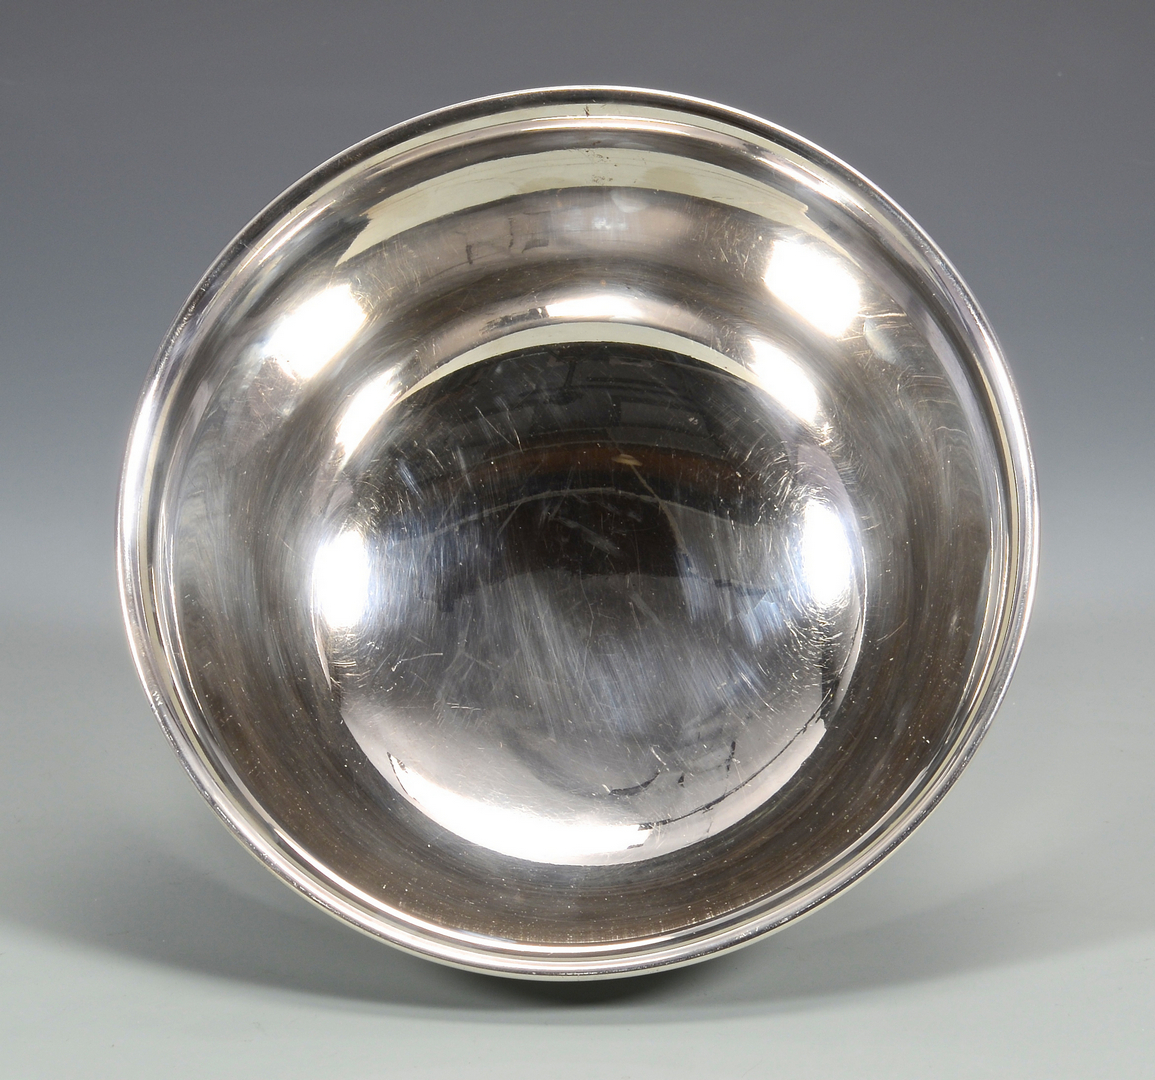 Lot 335 Tiffany Sterling Silver Bowl